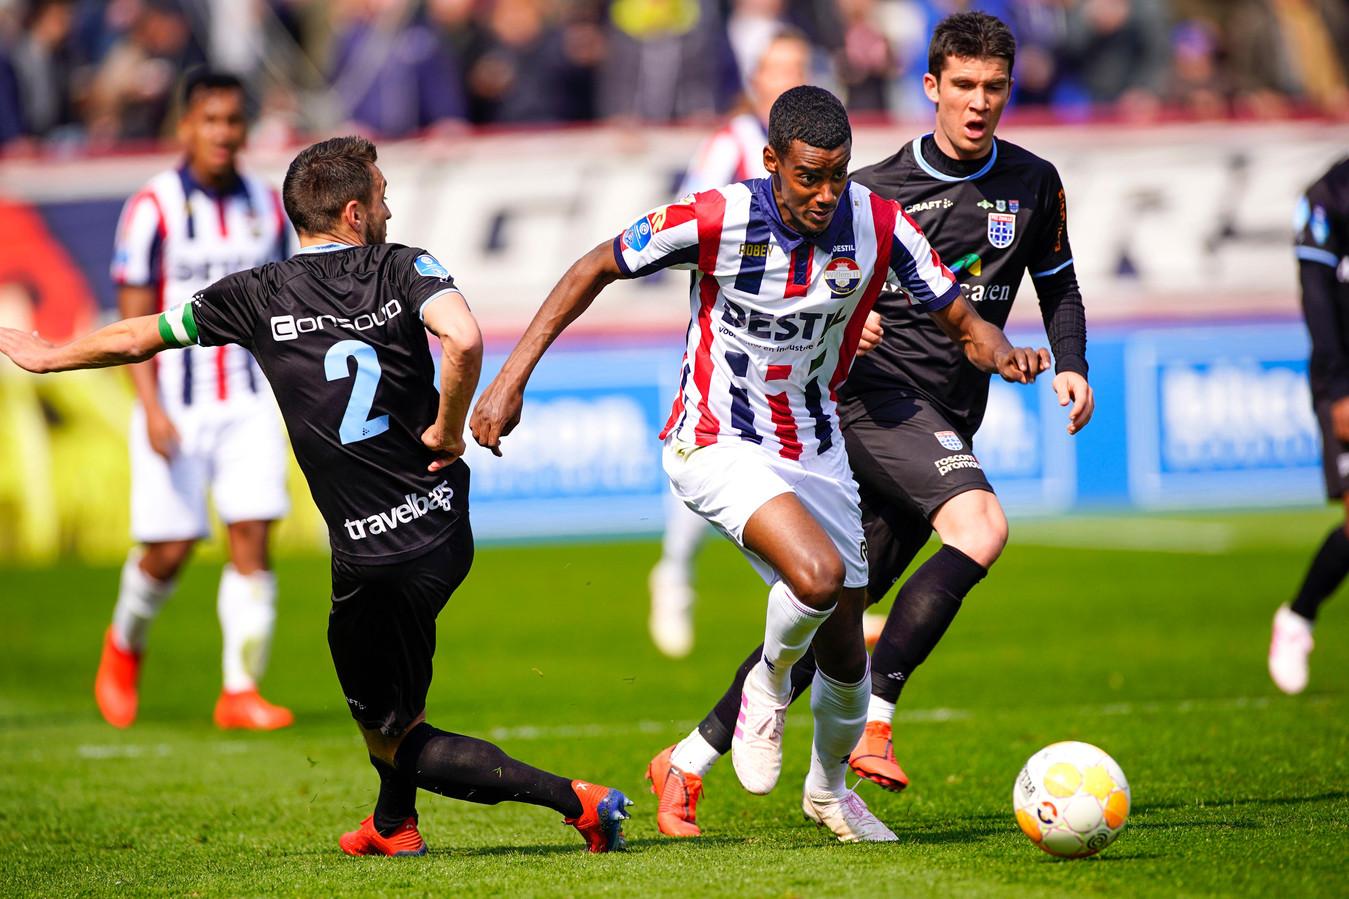 Alexander Isak snelt langs twee spelers van PEC Zwolle.